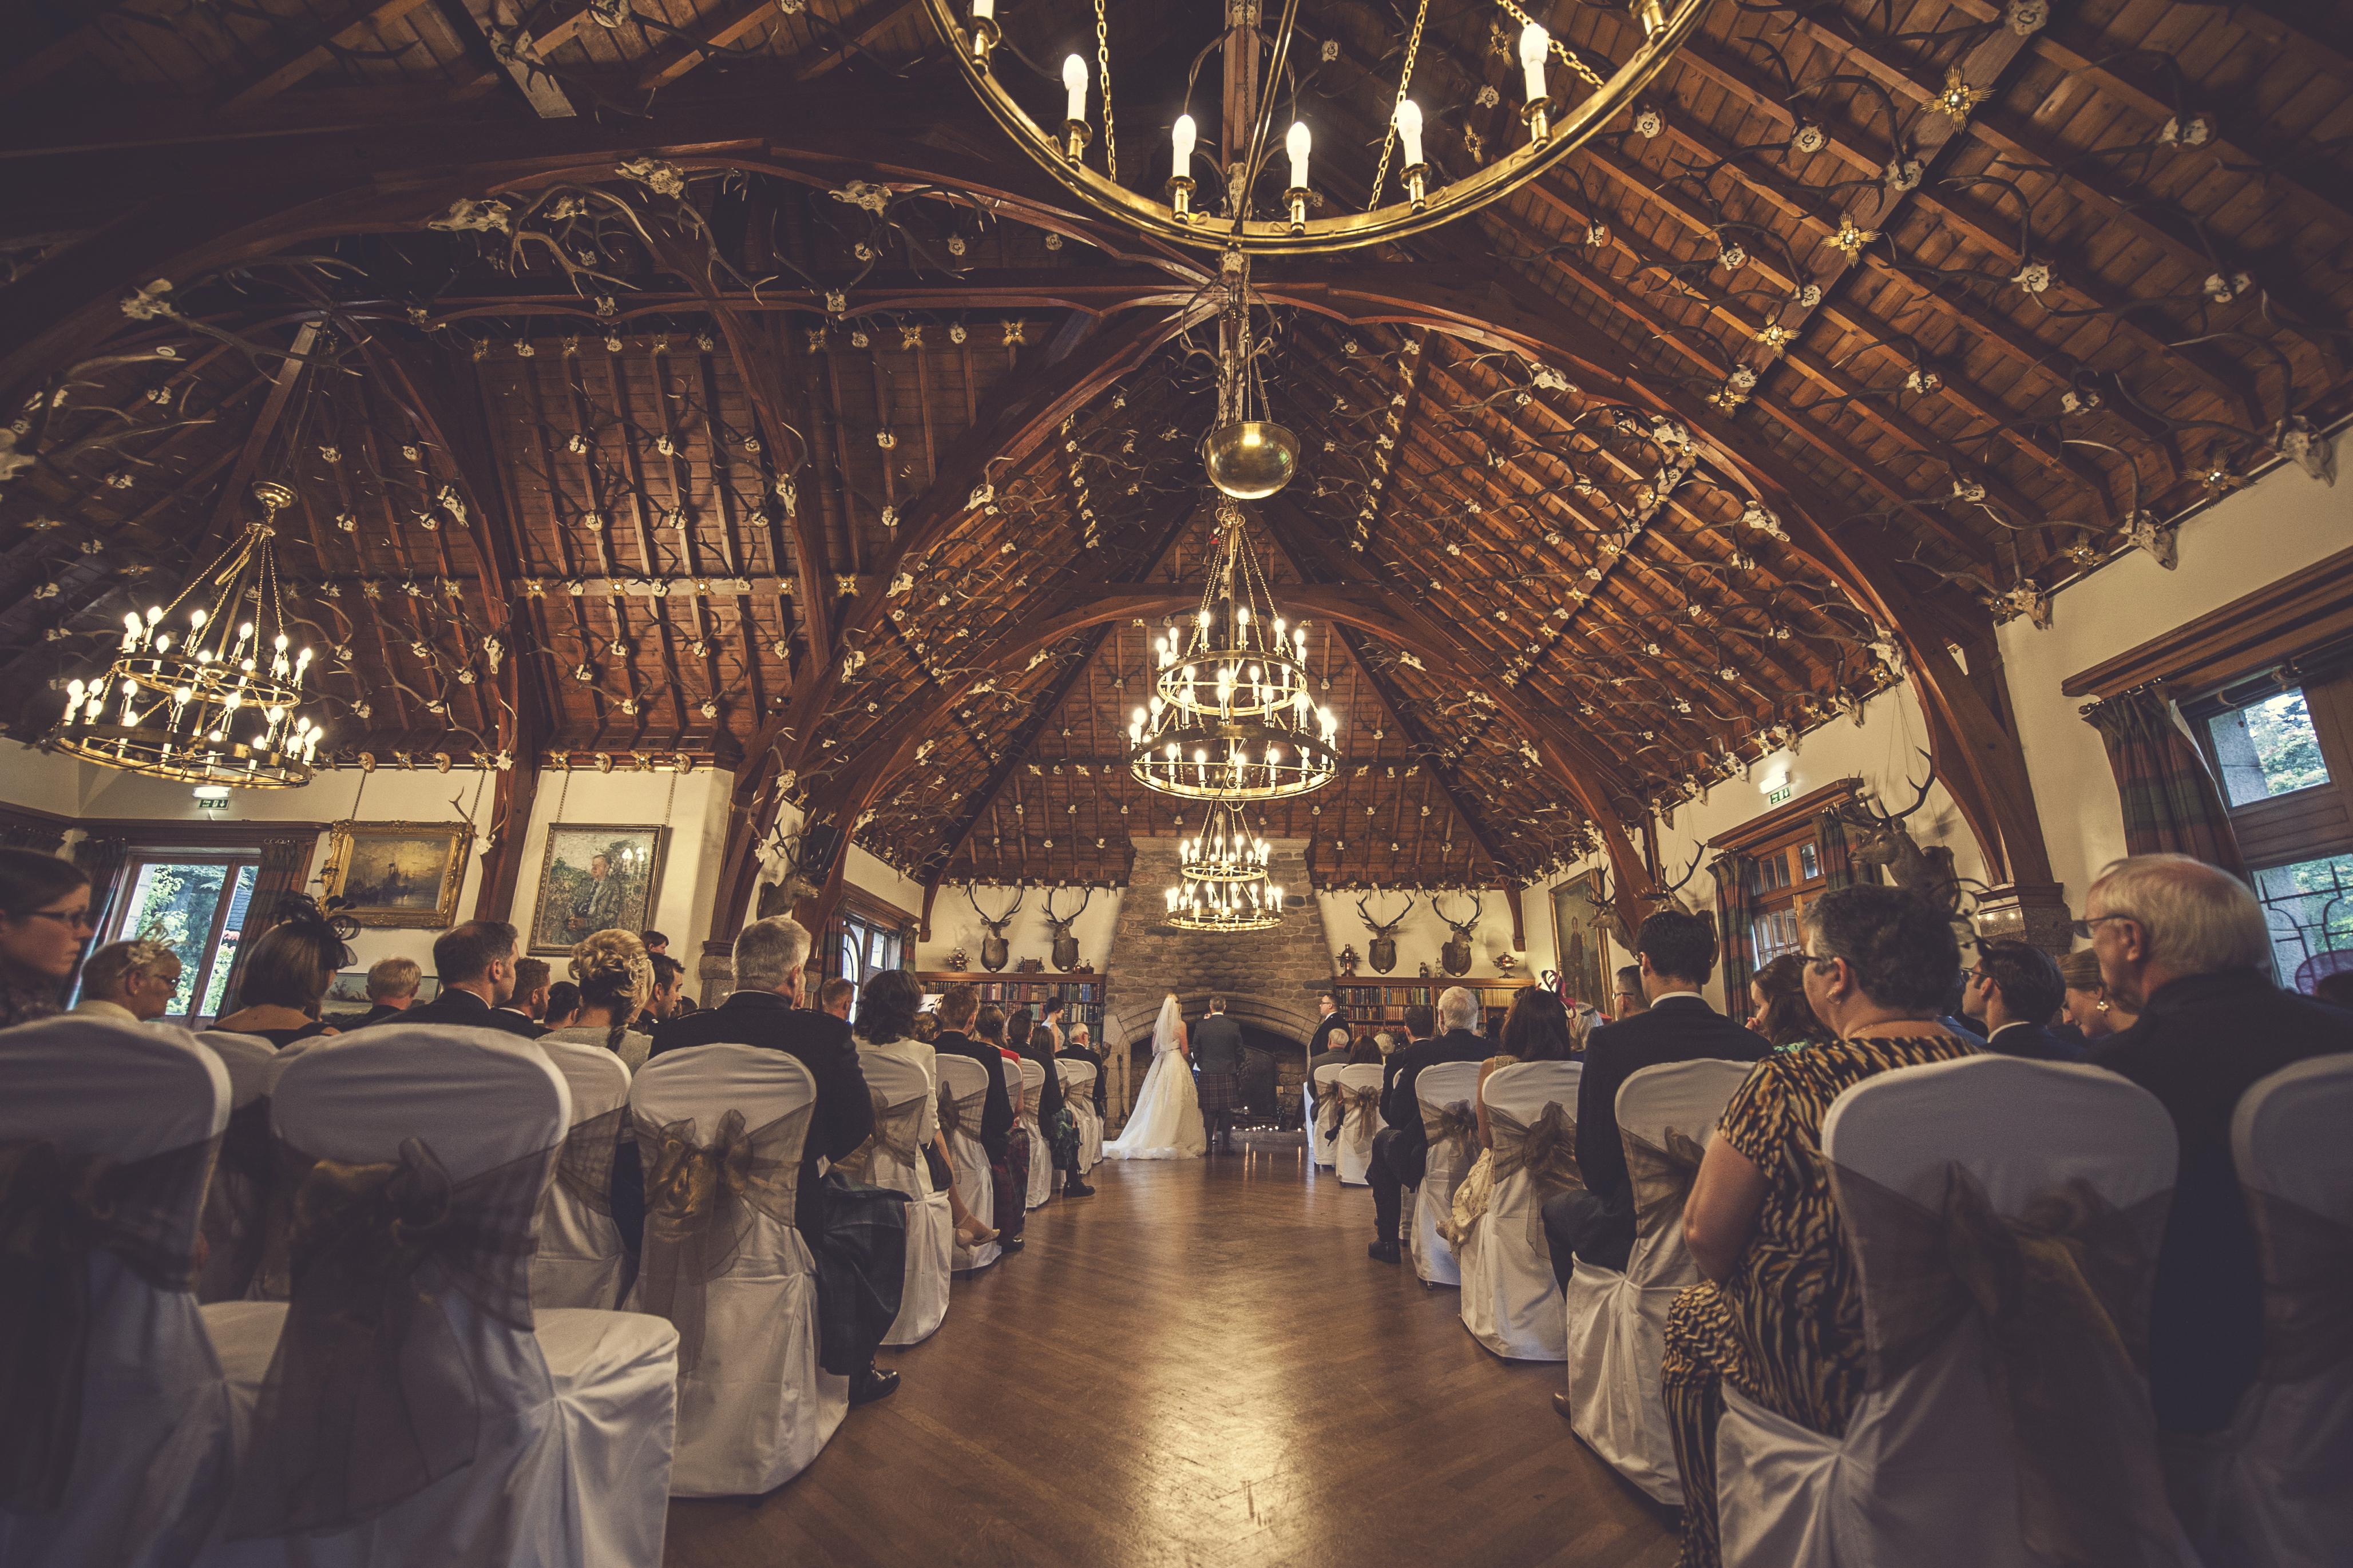 A Fairytale Wedding Venue With Beautiful Ballroom